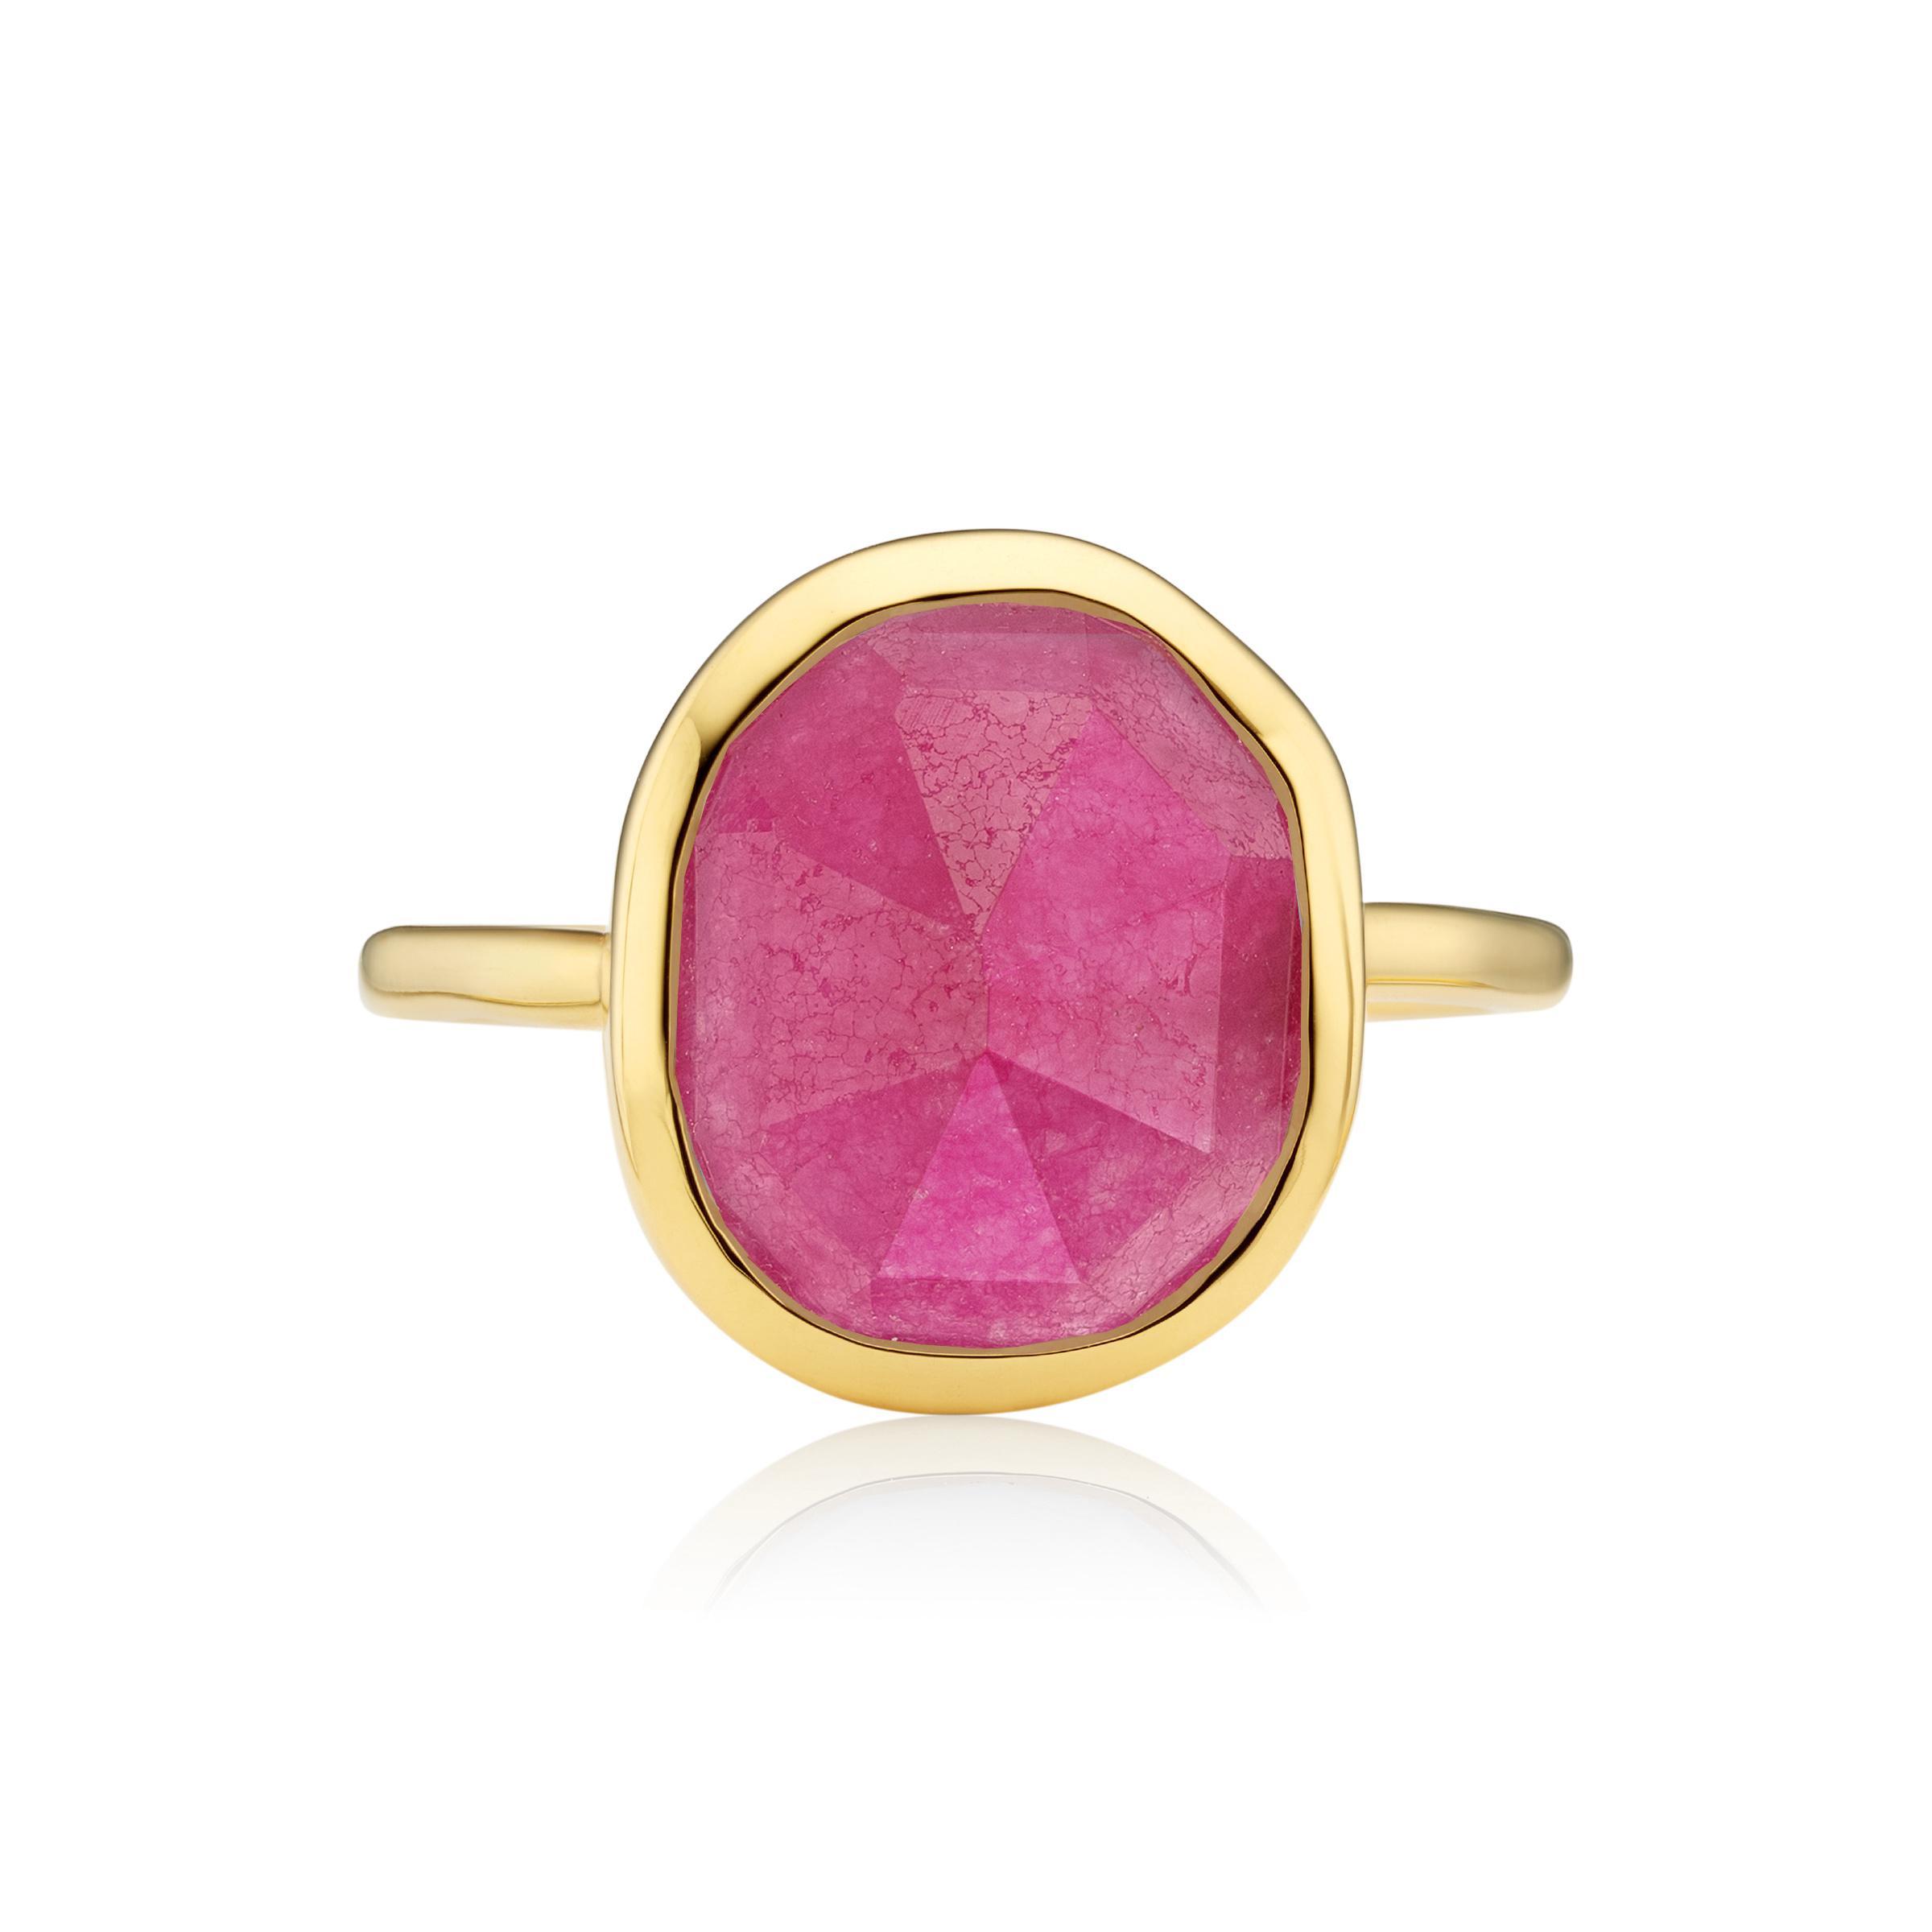 Lyst - Monica Vinader Siren Medium Stacking Ring in Pink